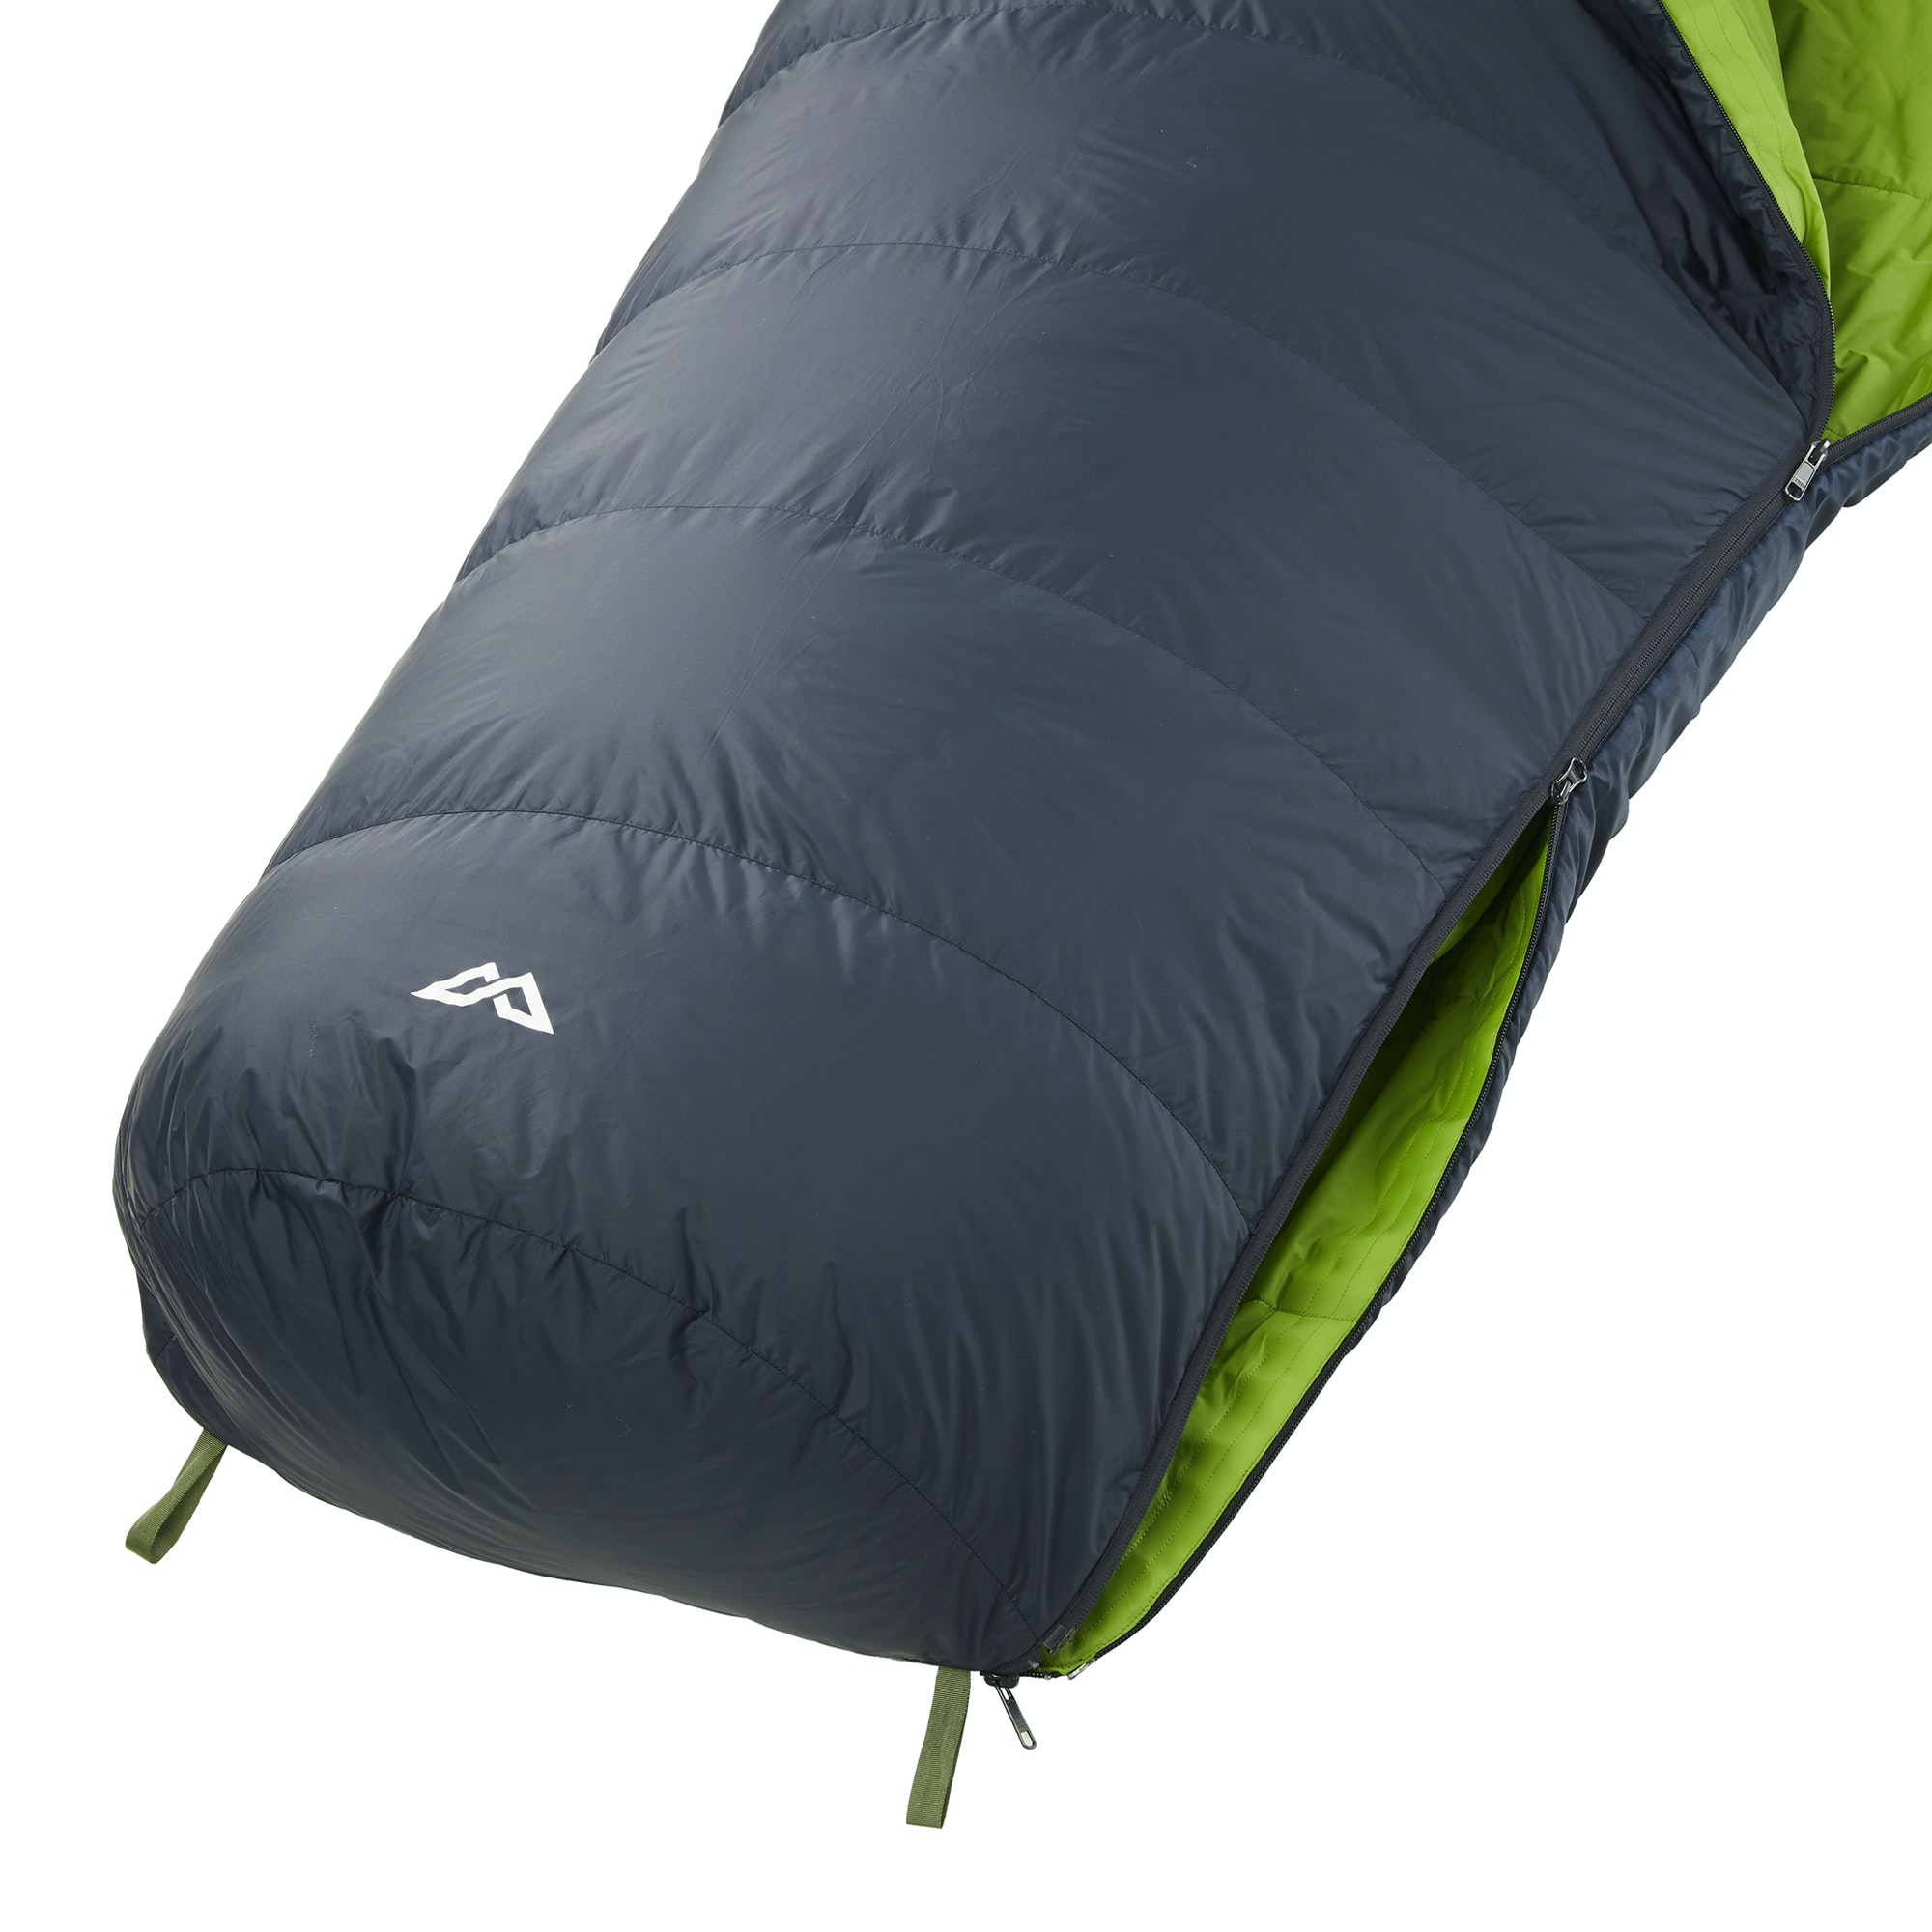 NEW-Kathmandu-Icarus-Hybrid-Sleeping-Bag thumbnail 10